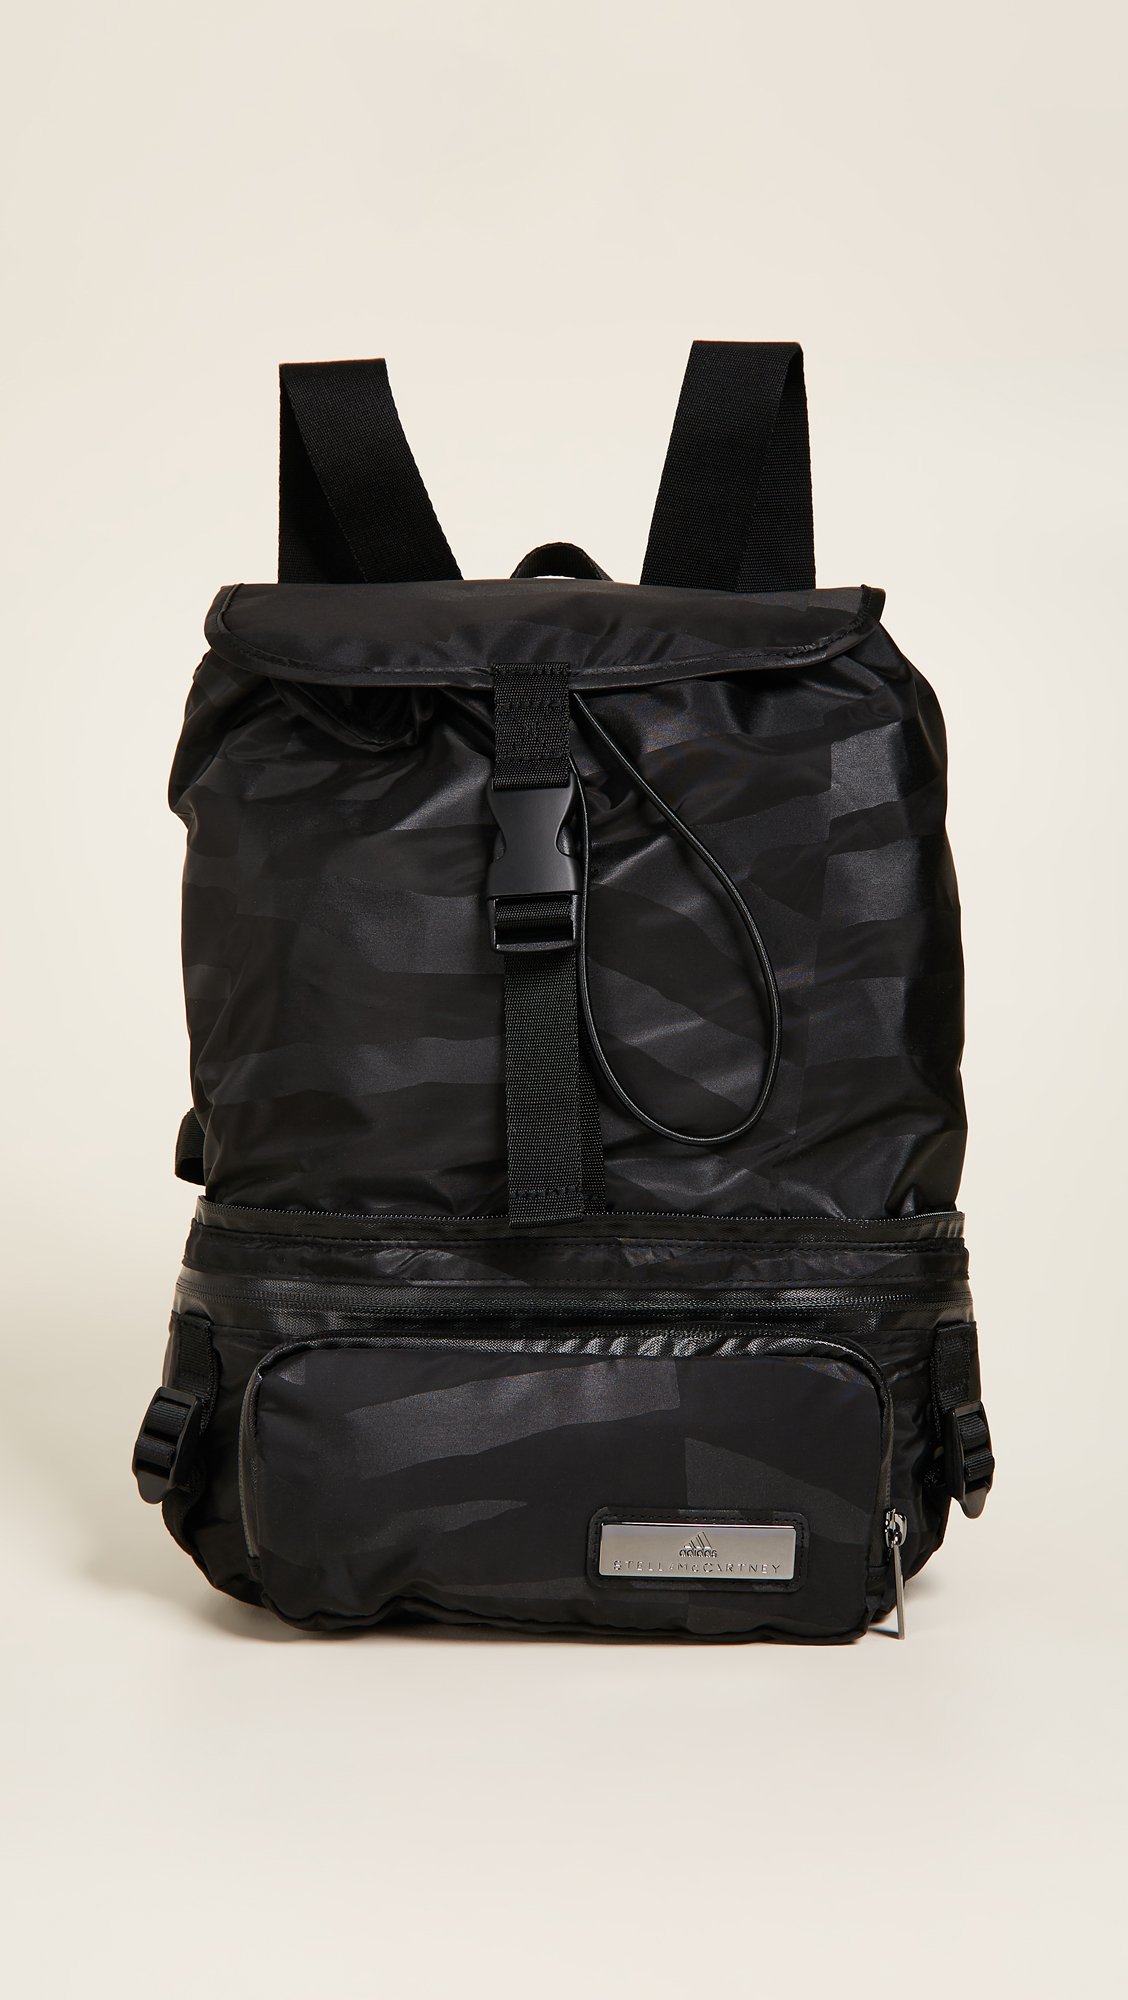 956e912bdf adidas by Stella McCartney Convertible Backpack